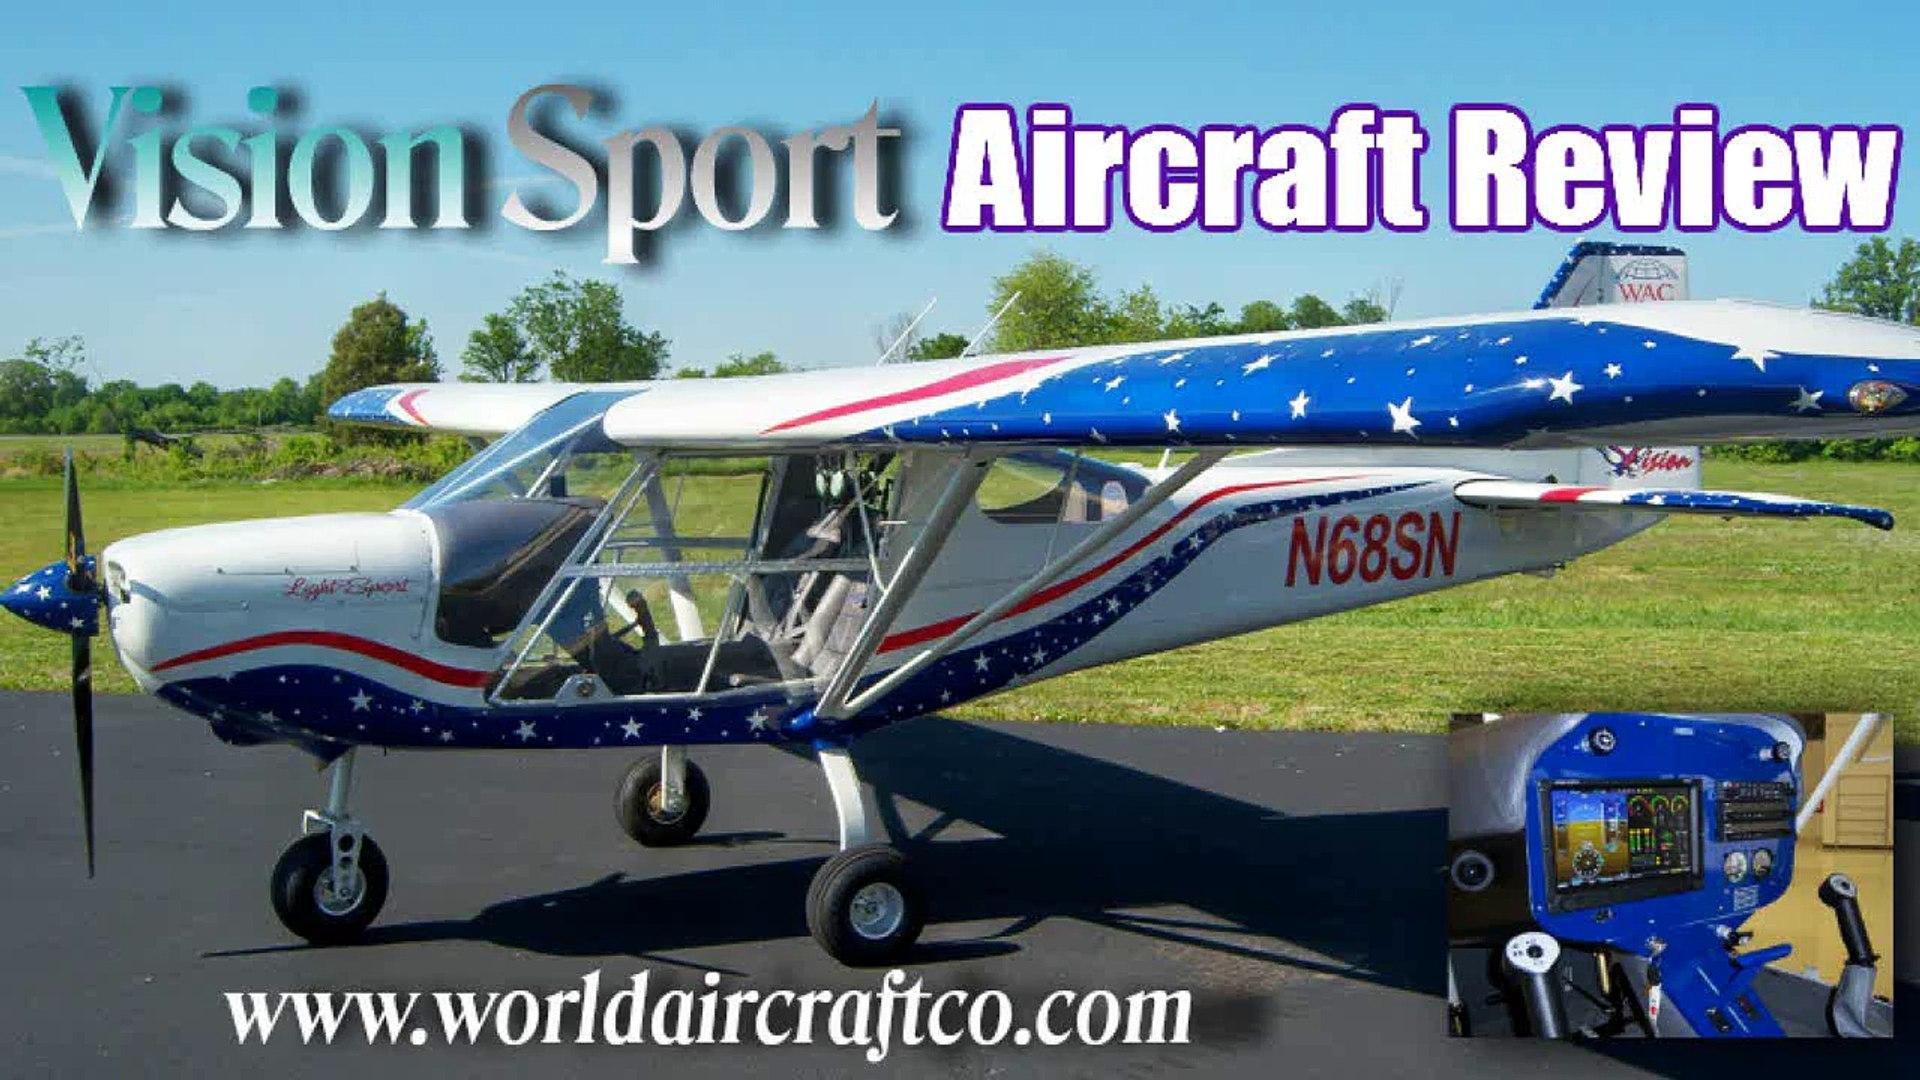 Vision Sport, World Aircraft's Vision Sport light sport aircraft review Volume II.